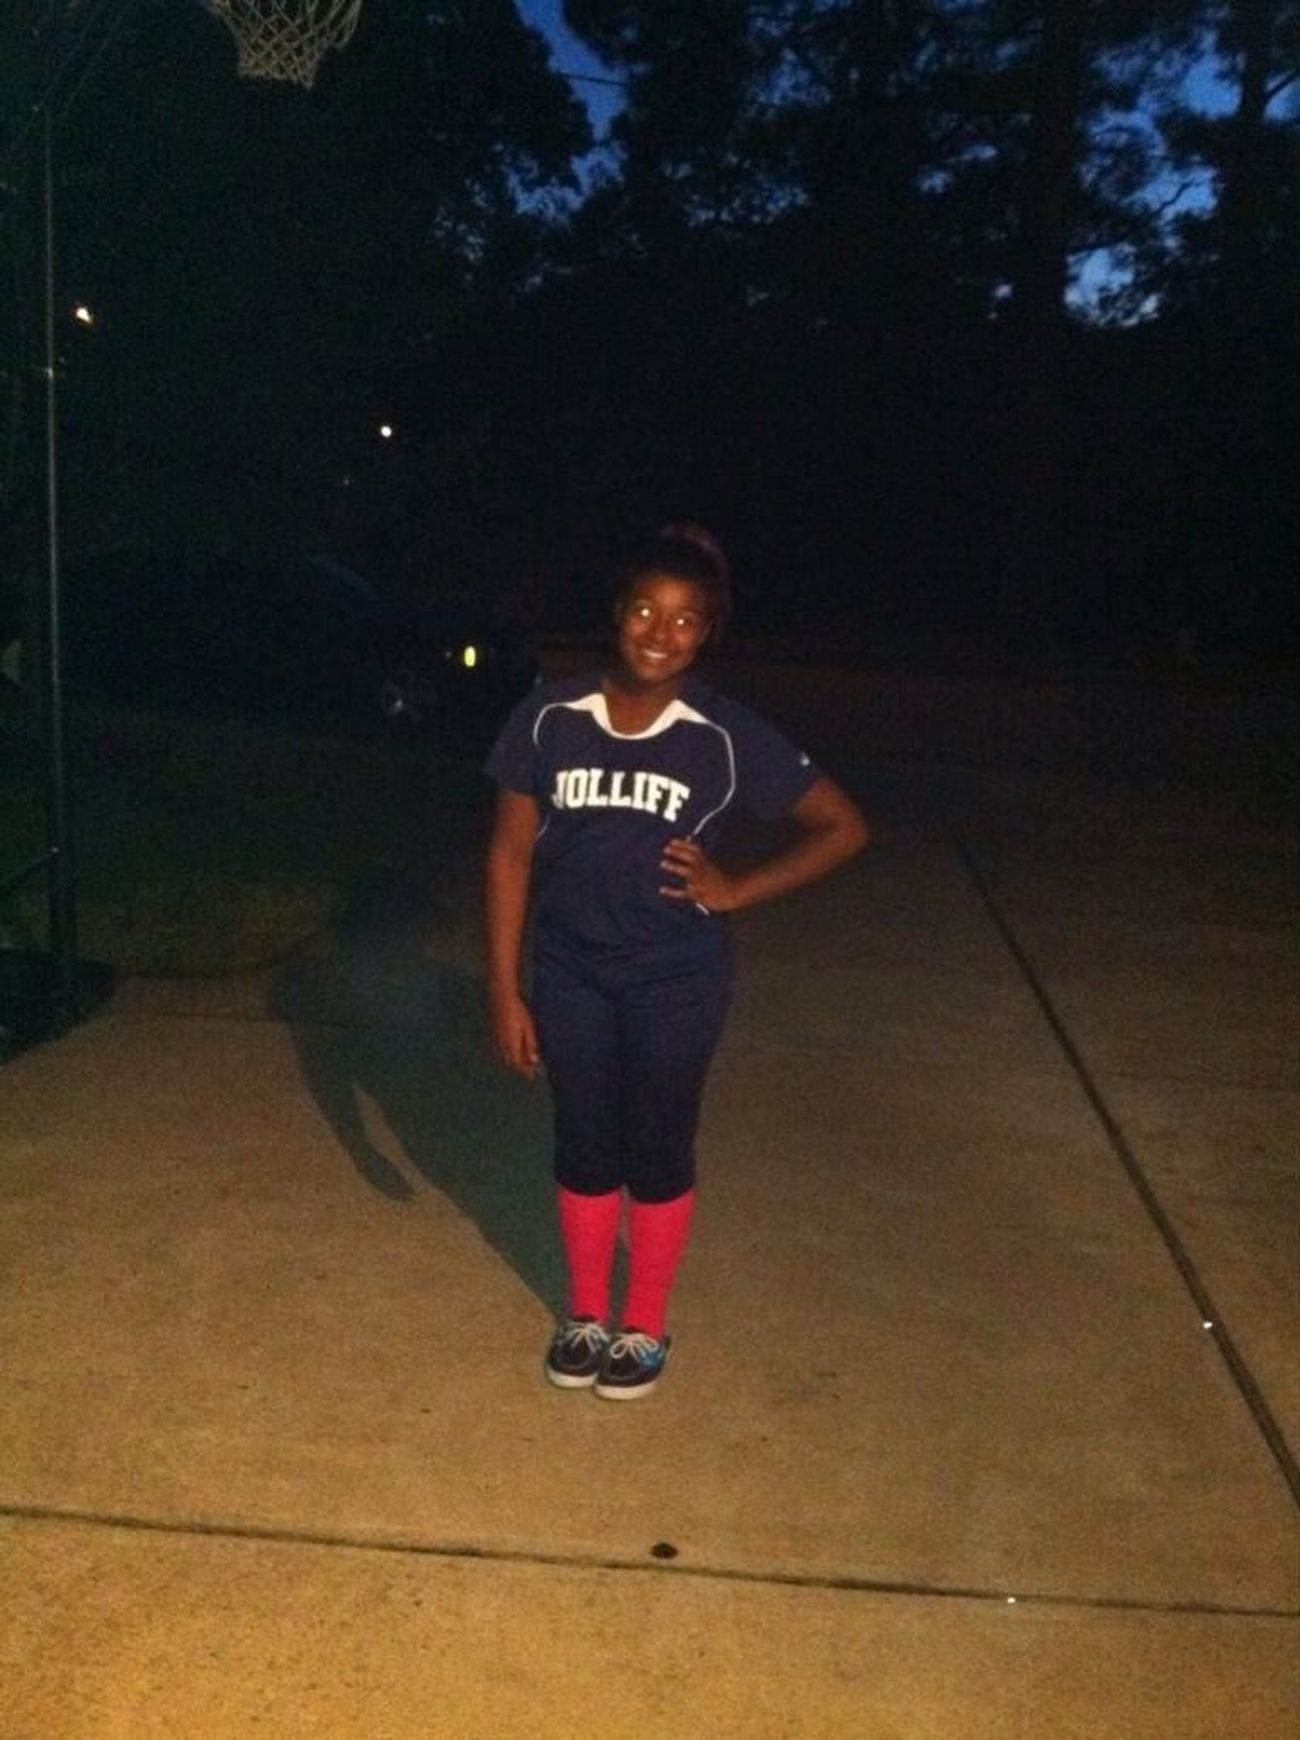 Loving Softball